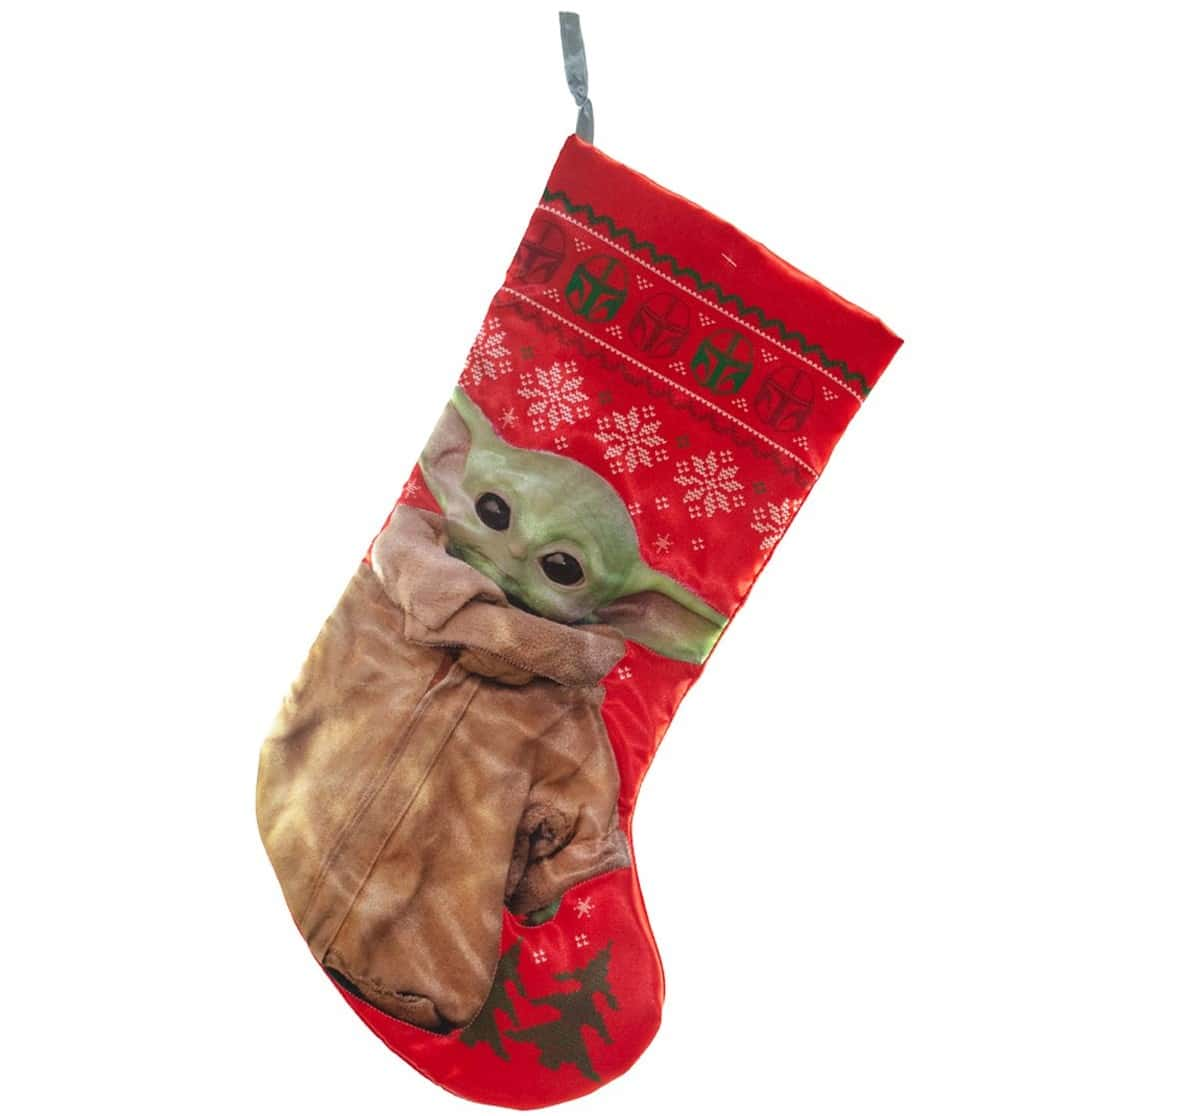 Baby Yoda Christmas stockings, nutcracker and snow globe make us feel like it's Christmas in June 11